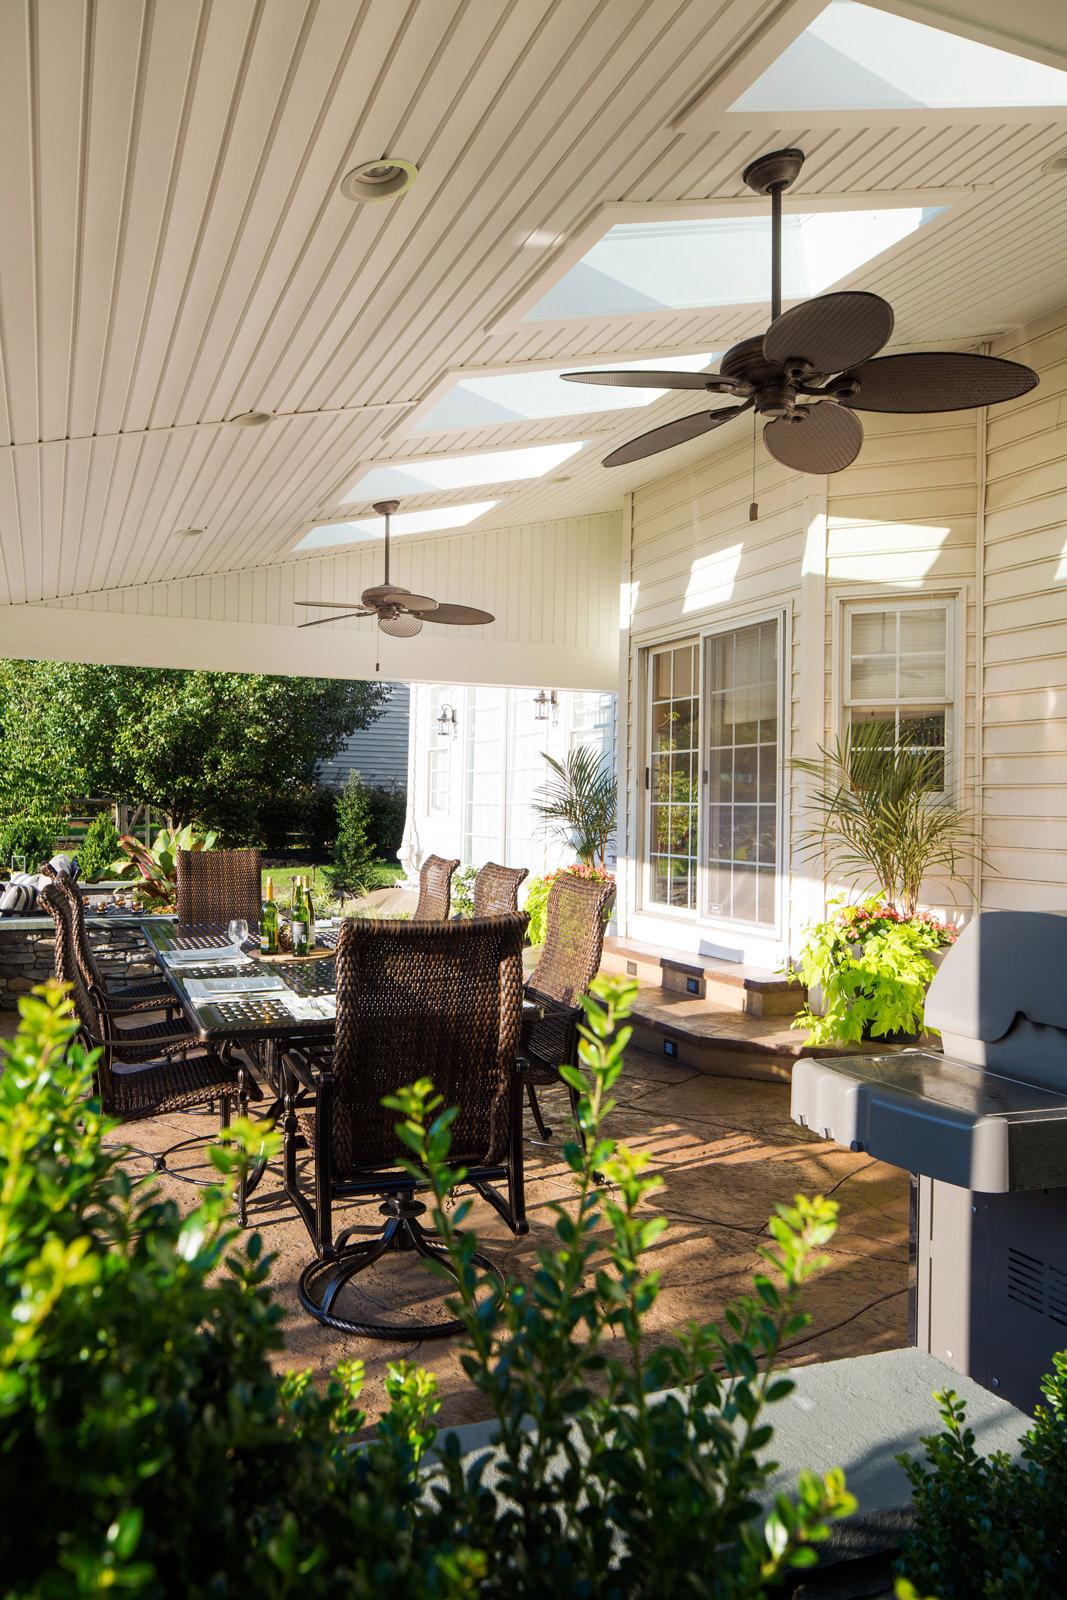 494A5019-edit-1 « MasterPLAN Outdoor Living on Masterplan Outdoor Living id=18063